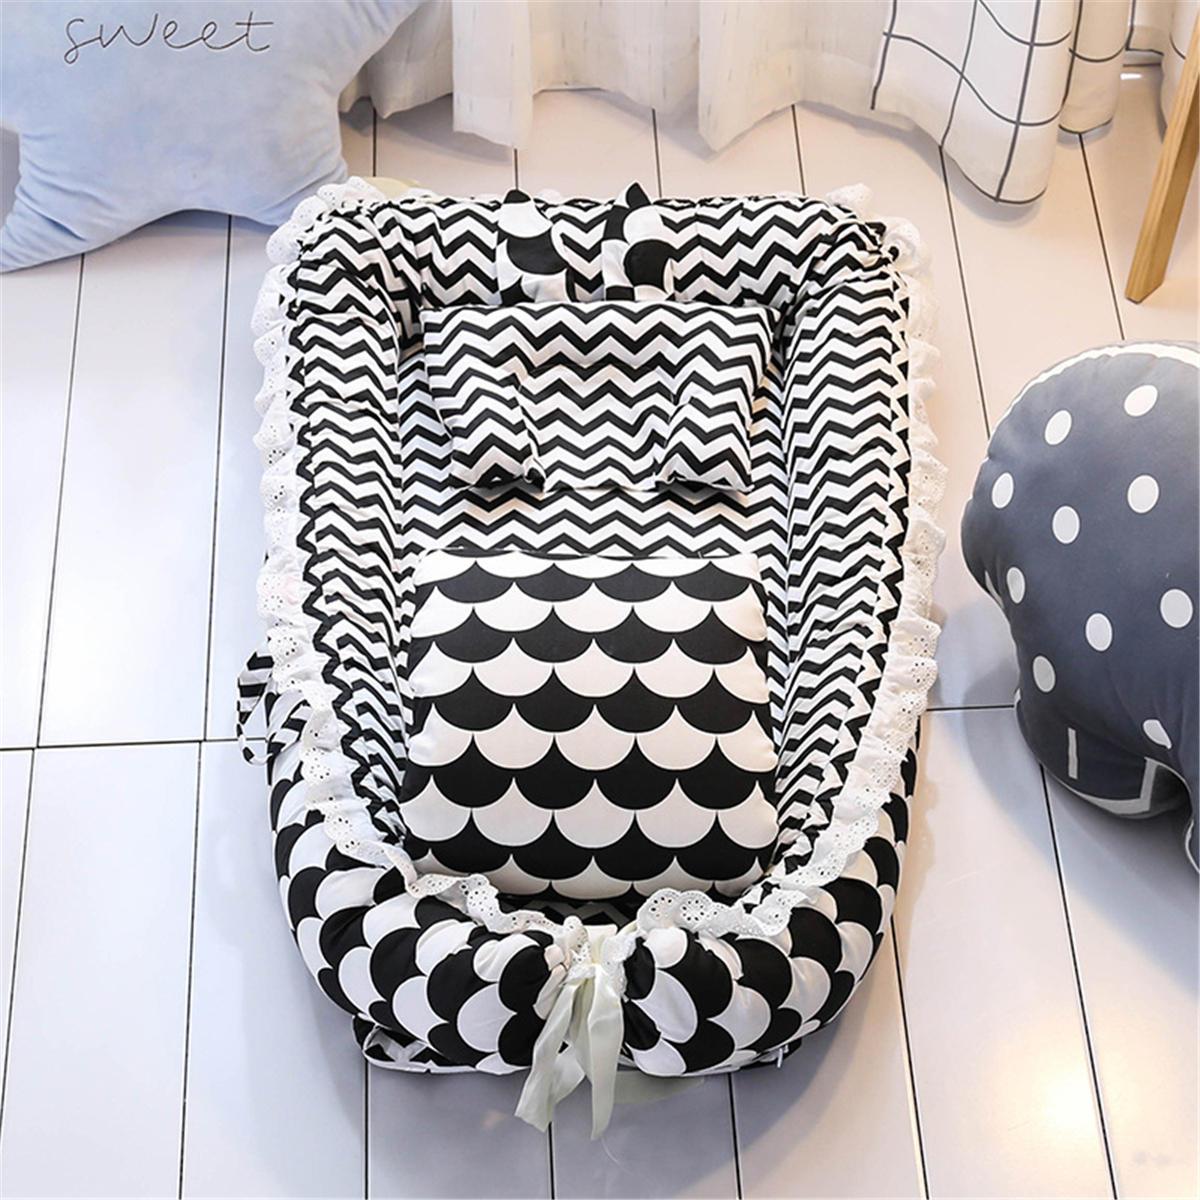 Baby Sleep Nest Bed Pillow Quilt Newborn Breathable Cotton Sleeping Cot Crib